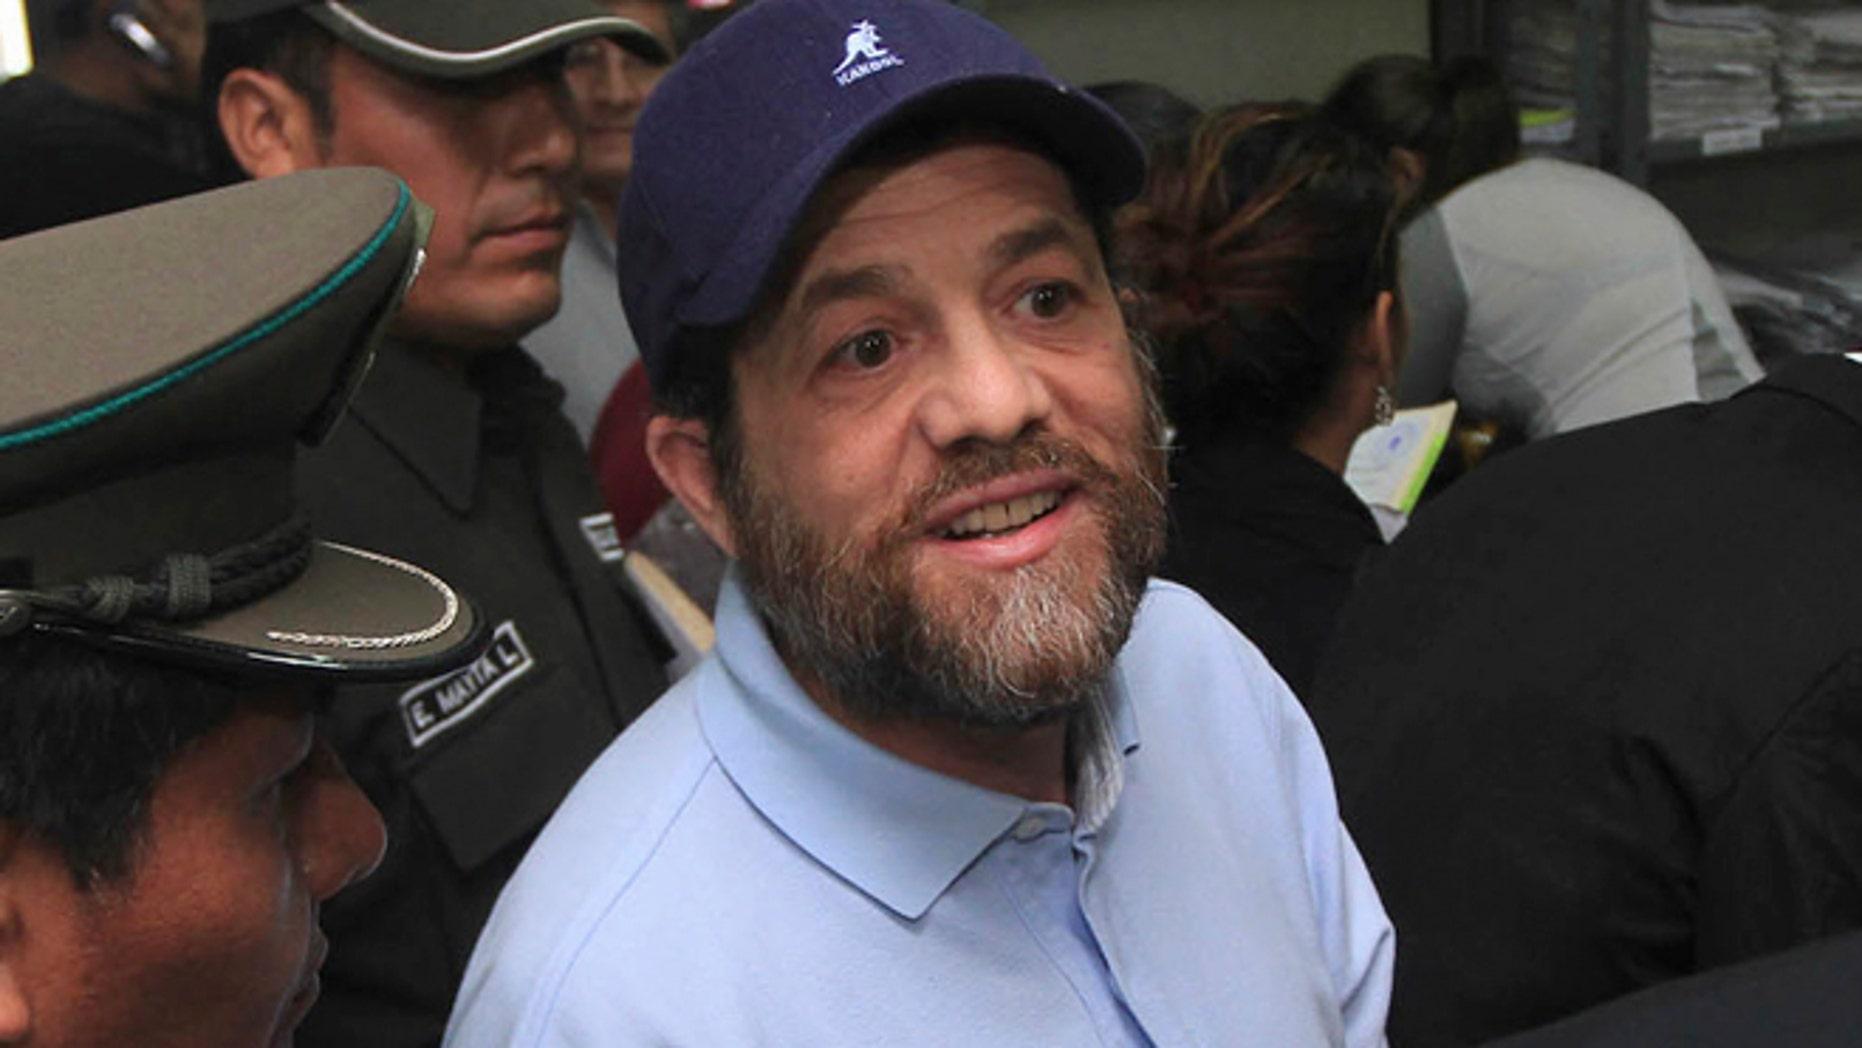 June 11, 2012: American Jacob Ostreicher is seen in a courtroom at Santa Cruz, Bolivia.